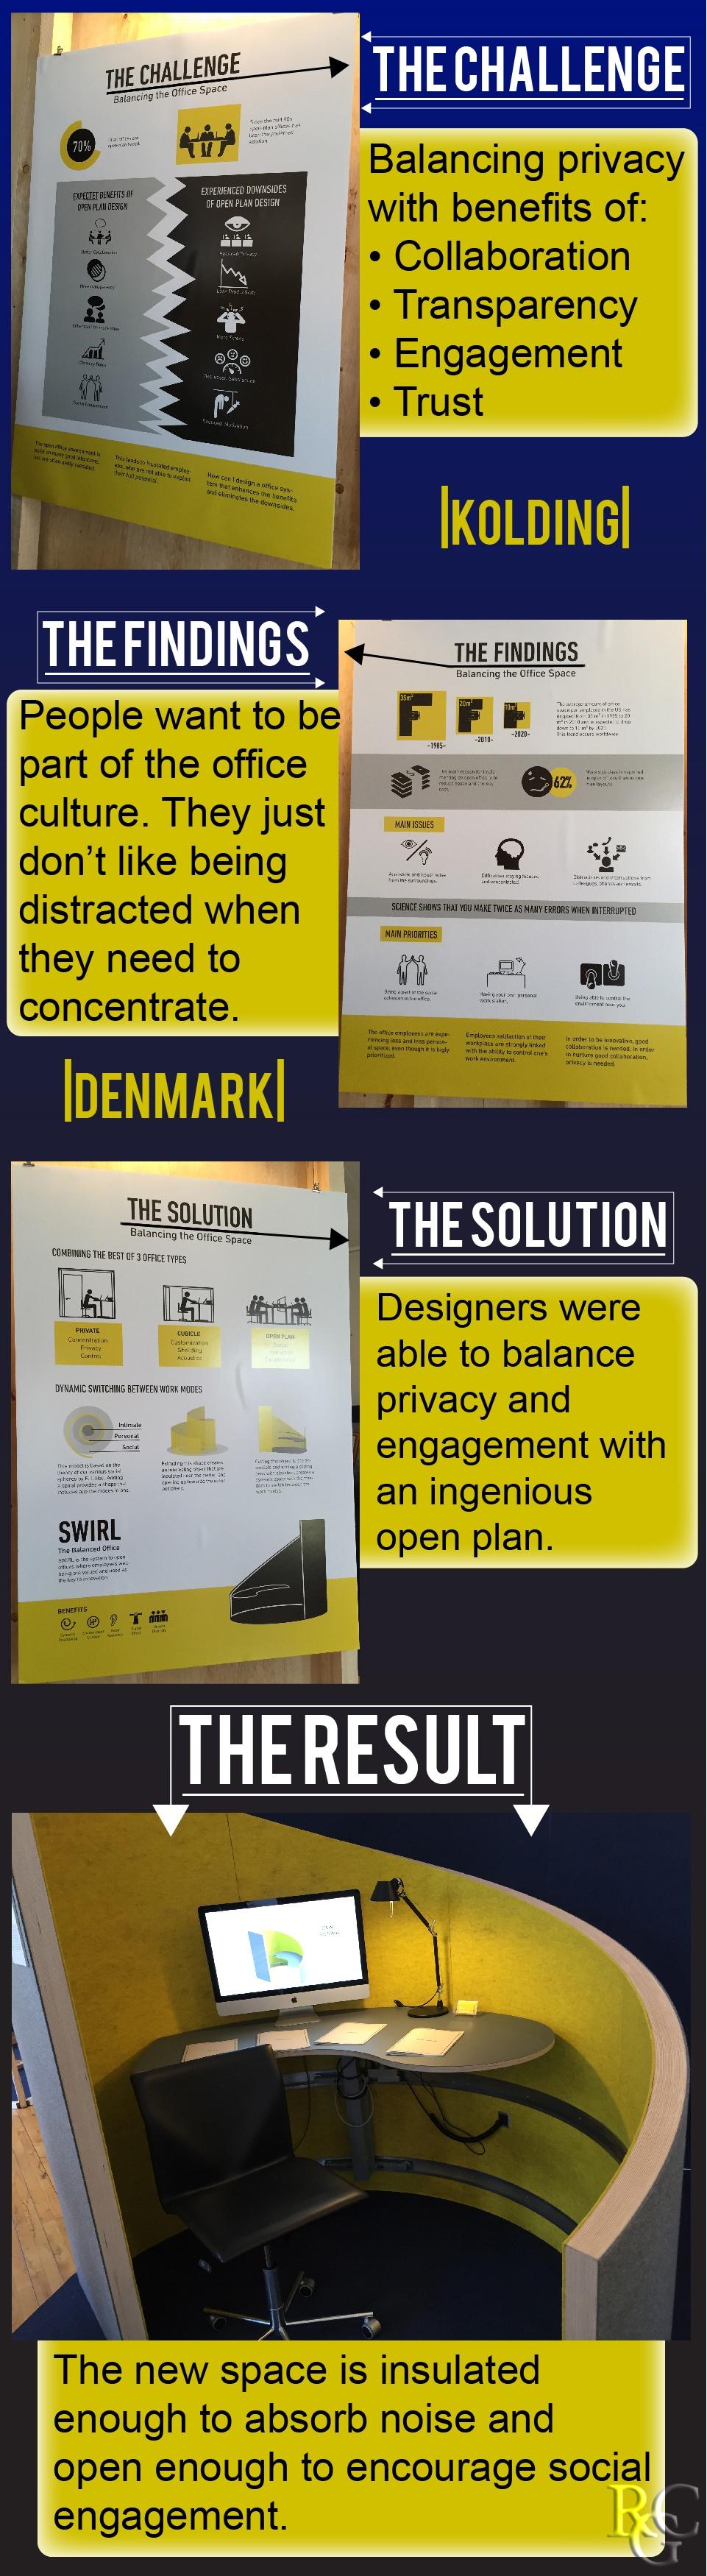 Kolding Denmark Discoveries